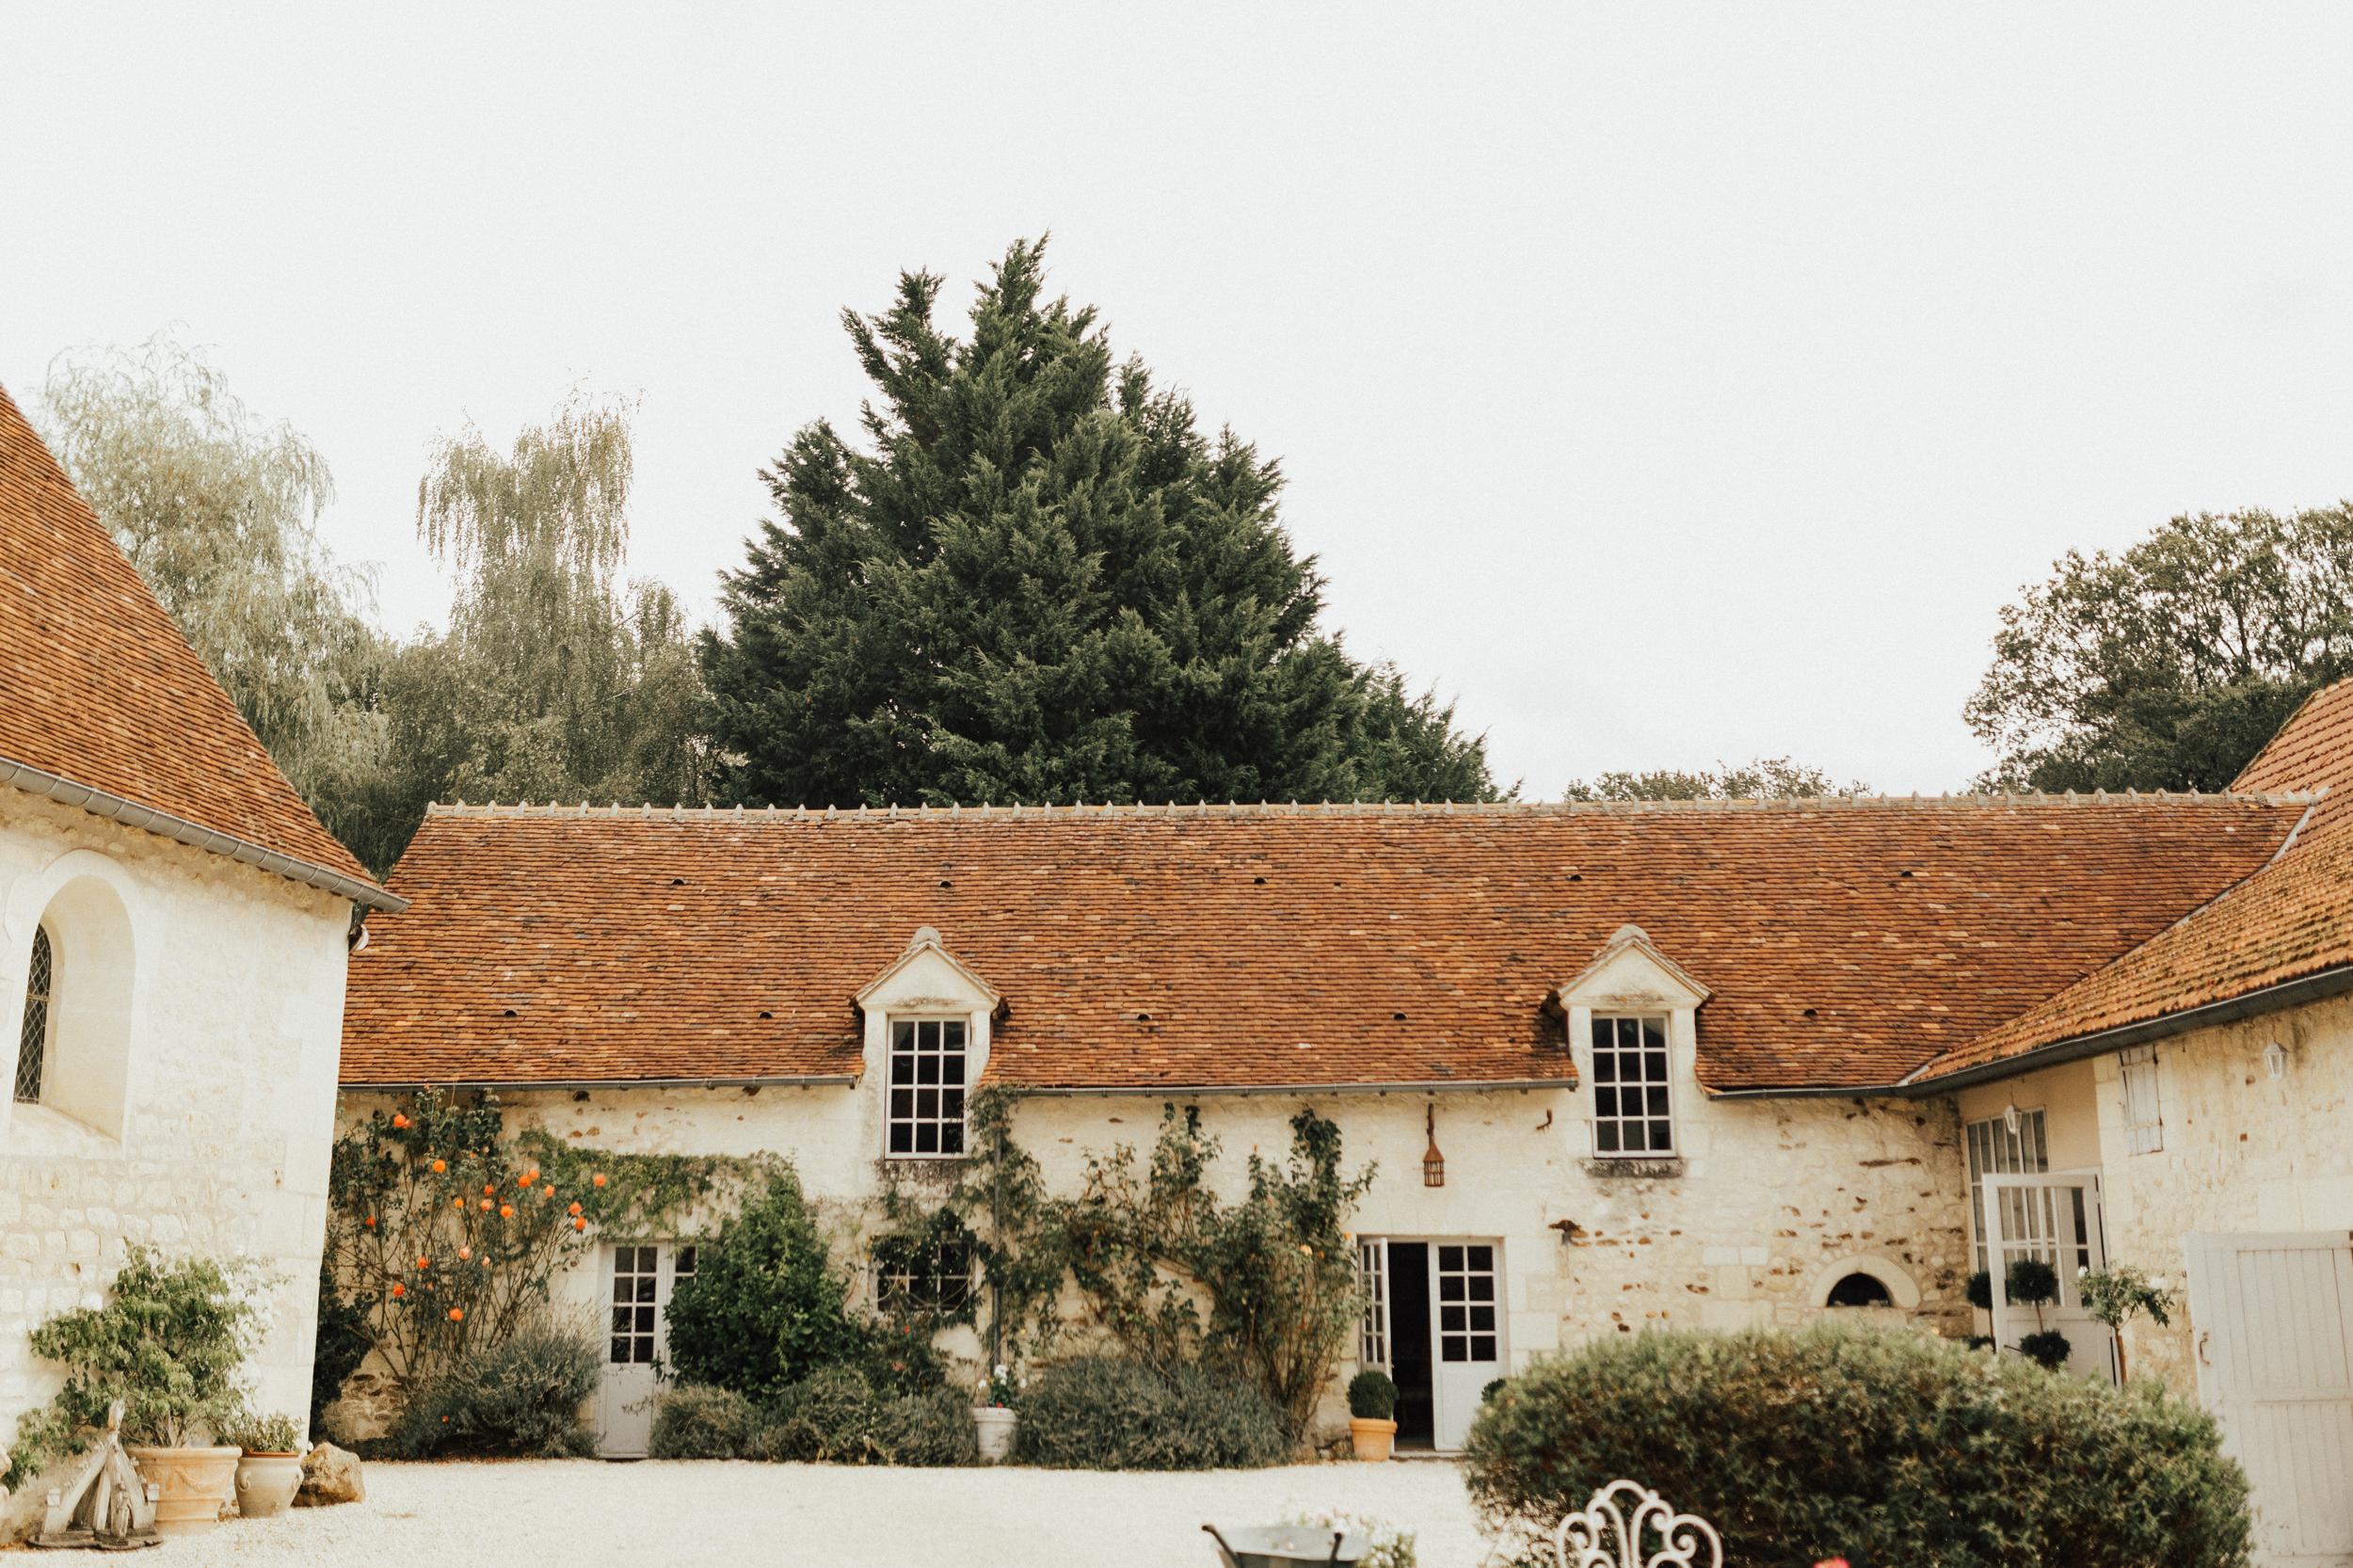 Amy-Zac-Destination-Wedding-France-Manoir-Foulquetiere-Darina-Stoda-Photography-1.jpg